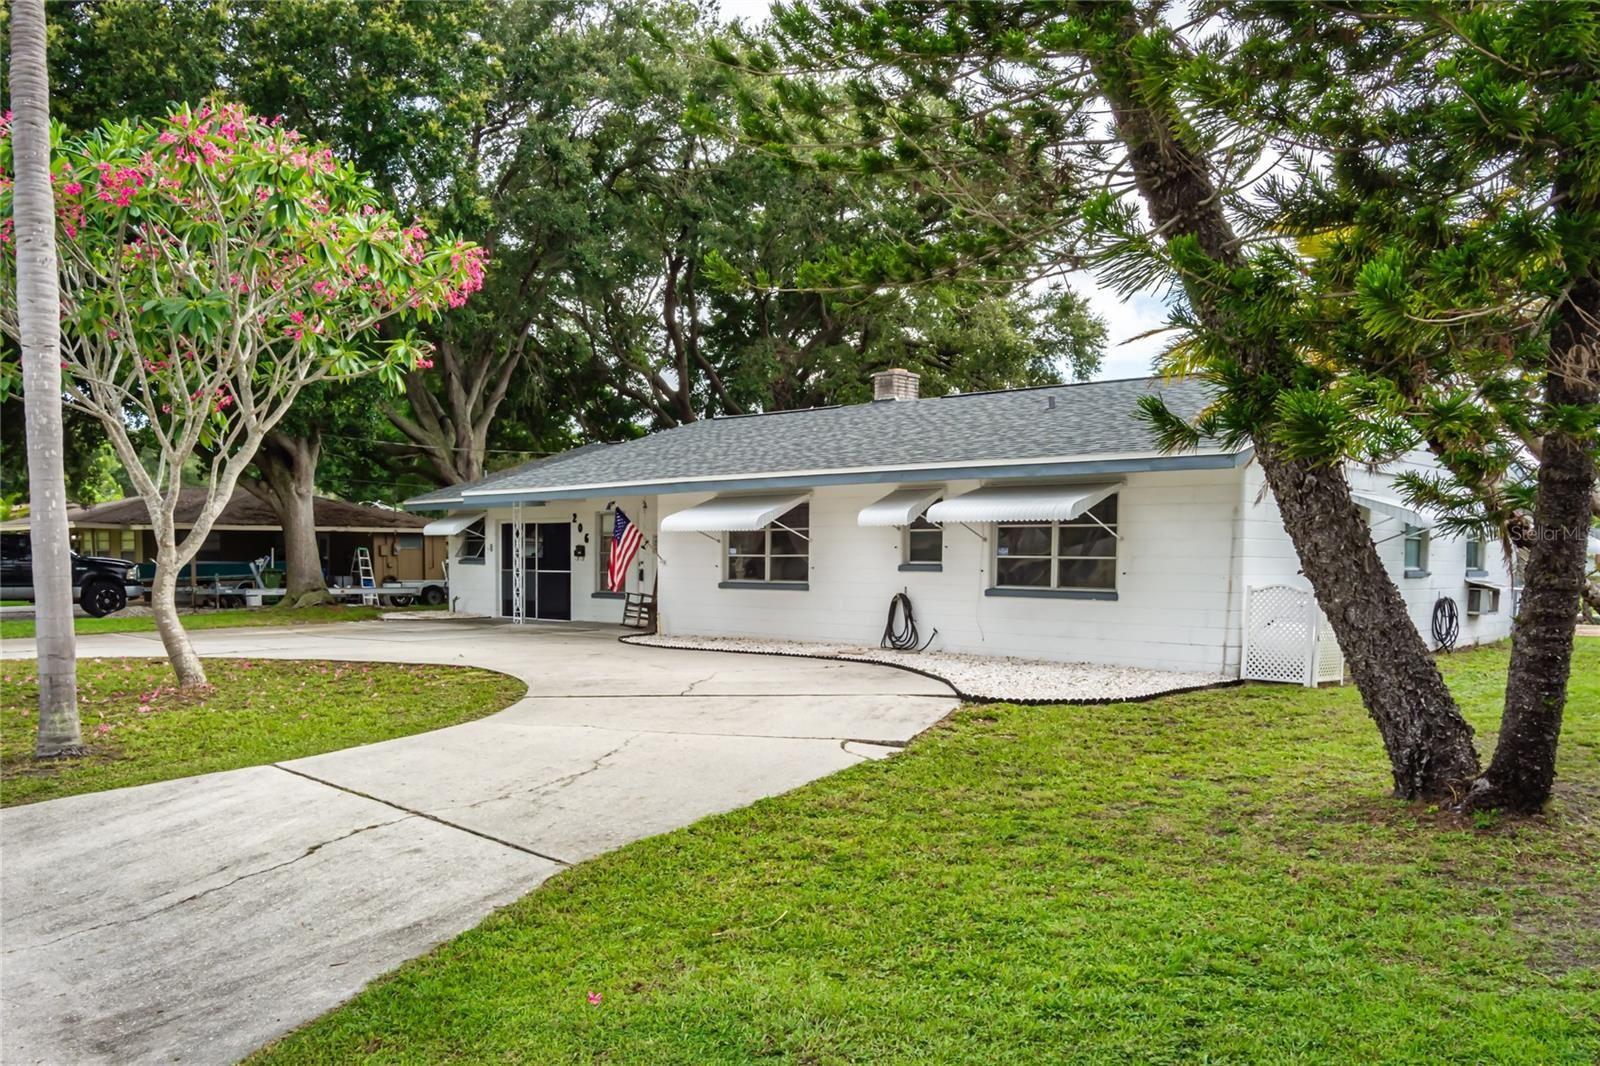 Photo of 206 22ND STREET NE, BRADENTON, FL 34208 (MLS # A4508095)